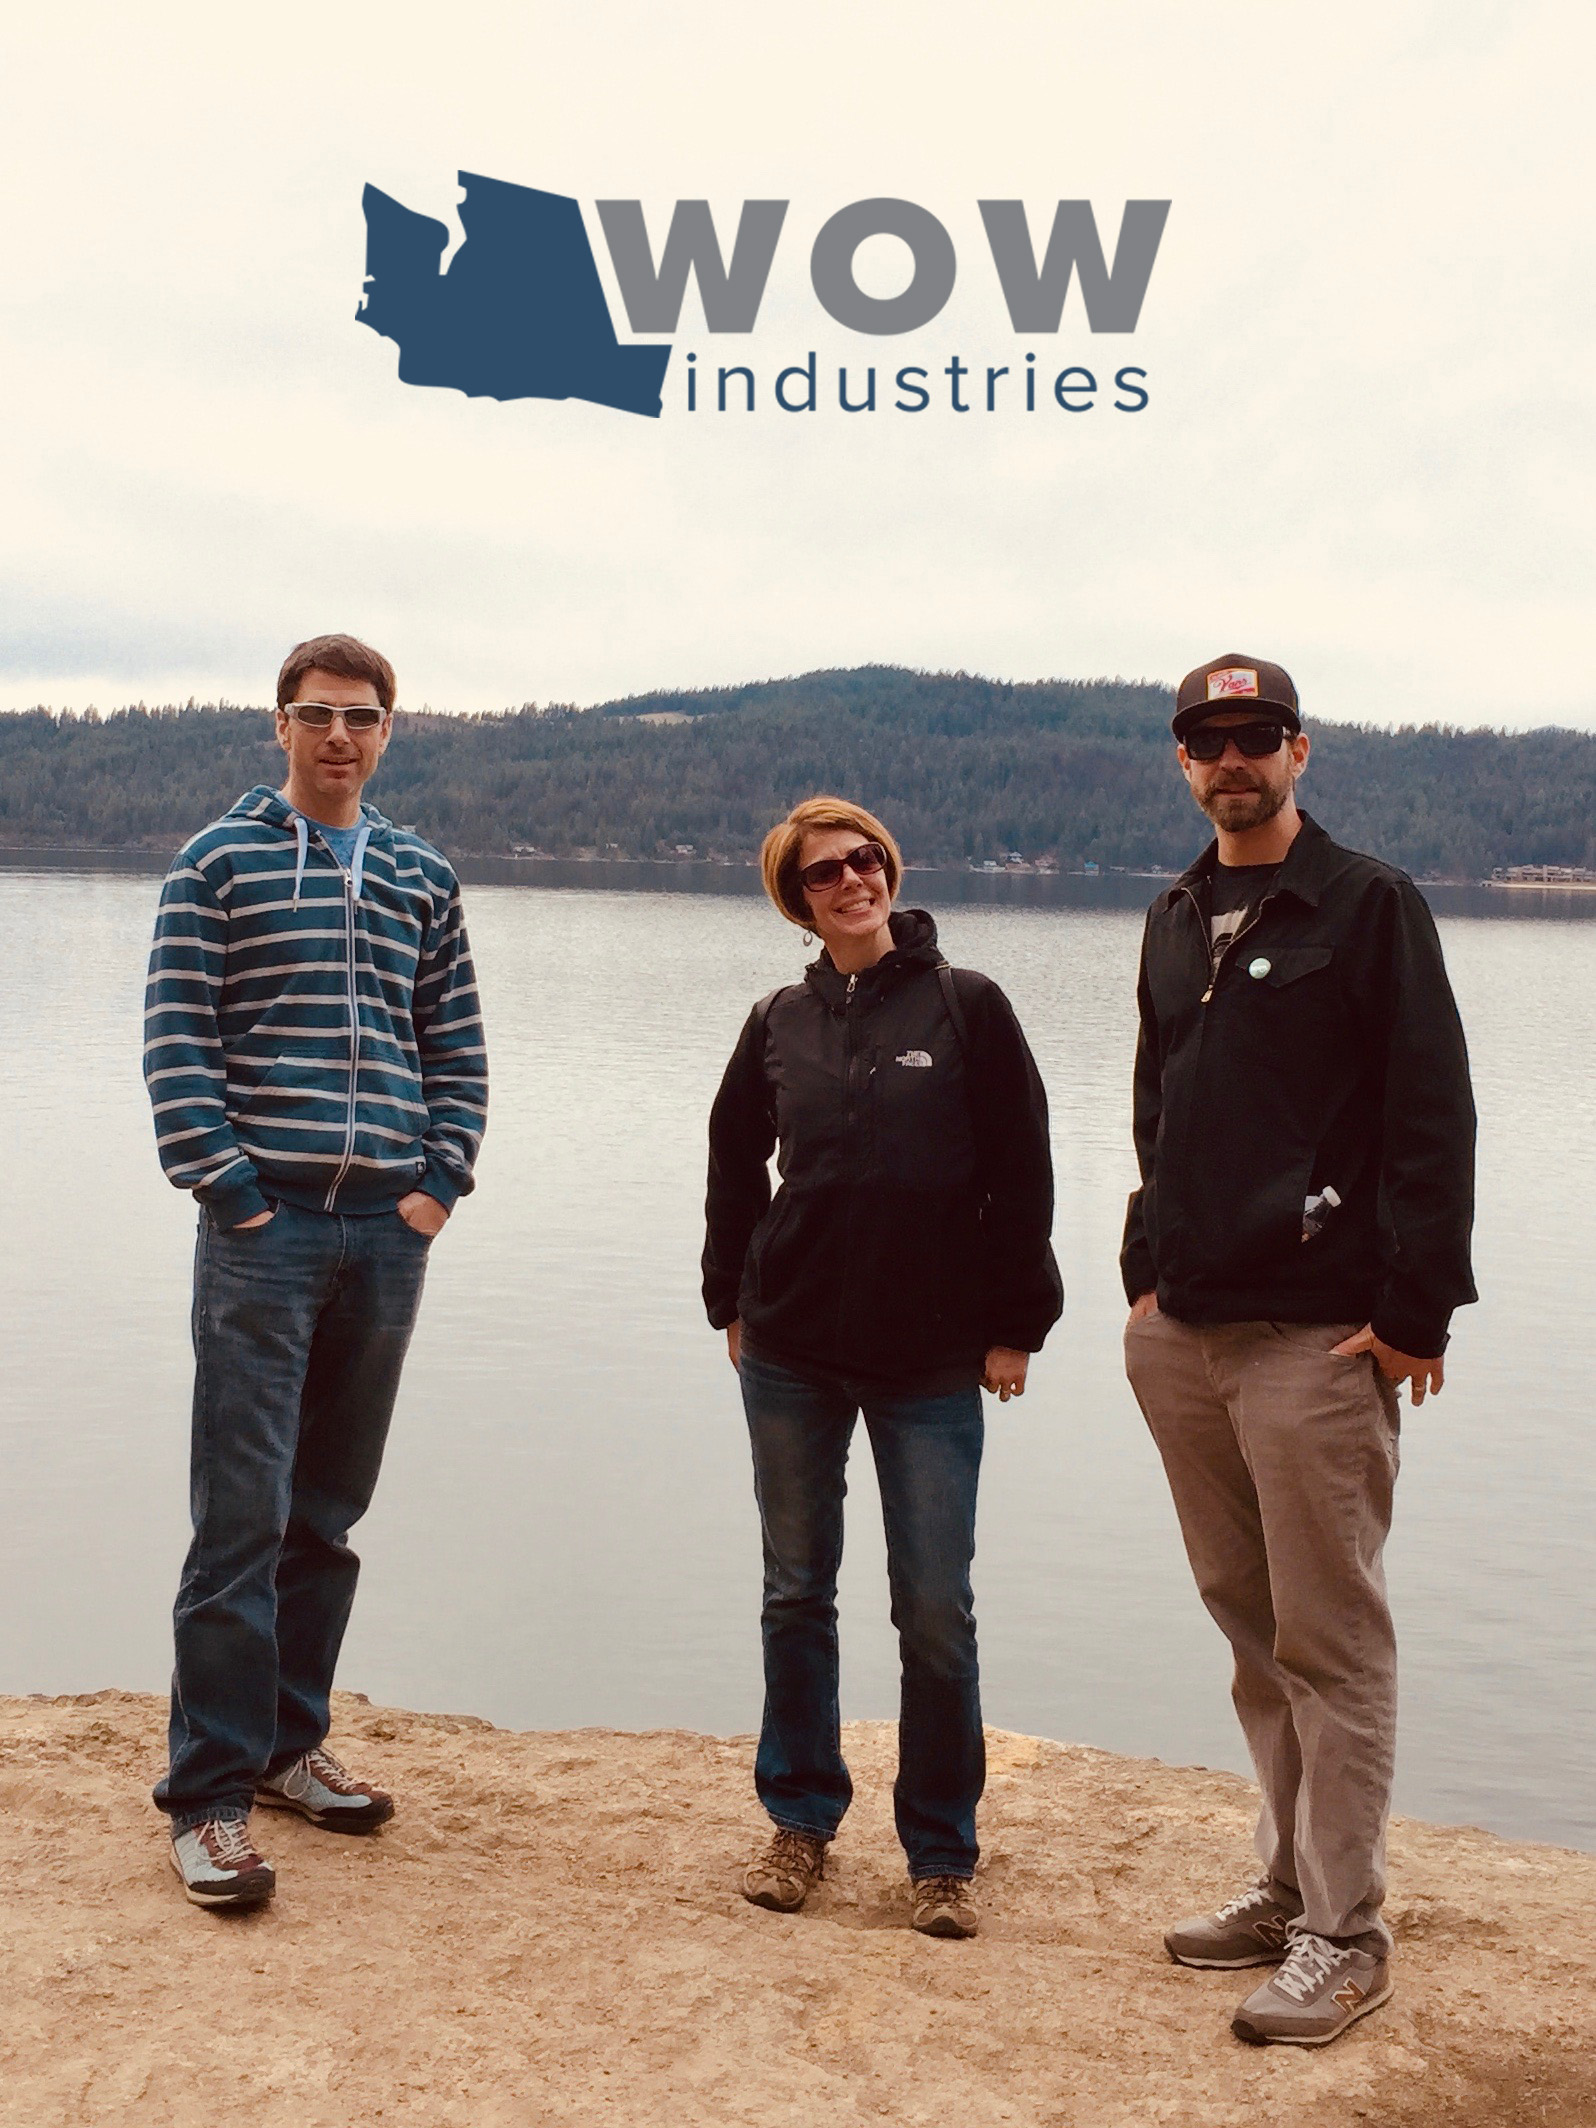 Cole Beaman, Jenn and Lance Lorz - Wow-Industries